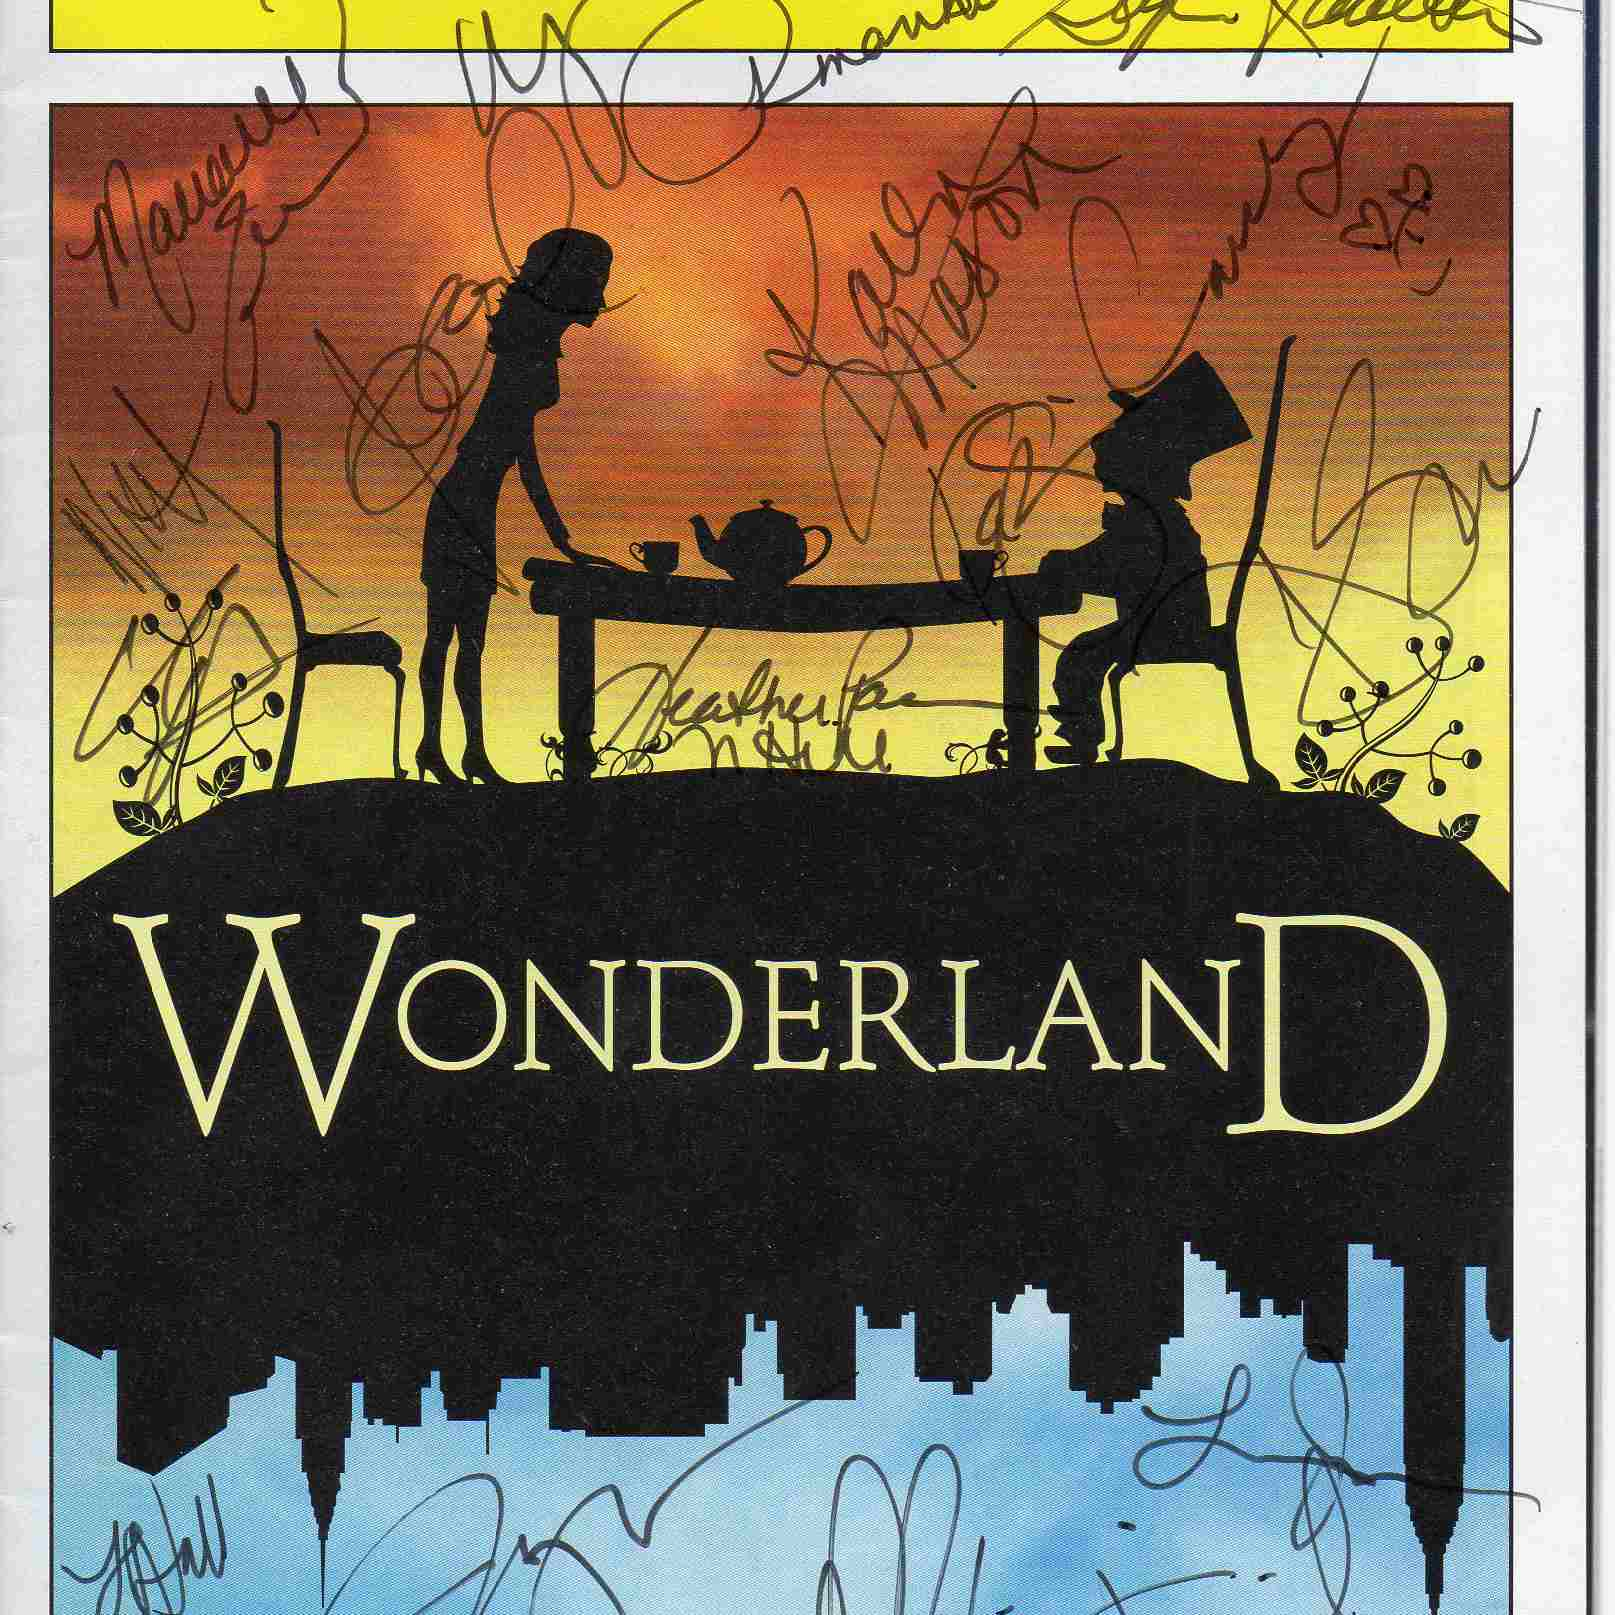 Wonderland Playbill cover